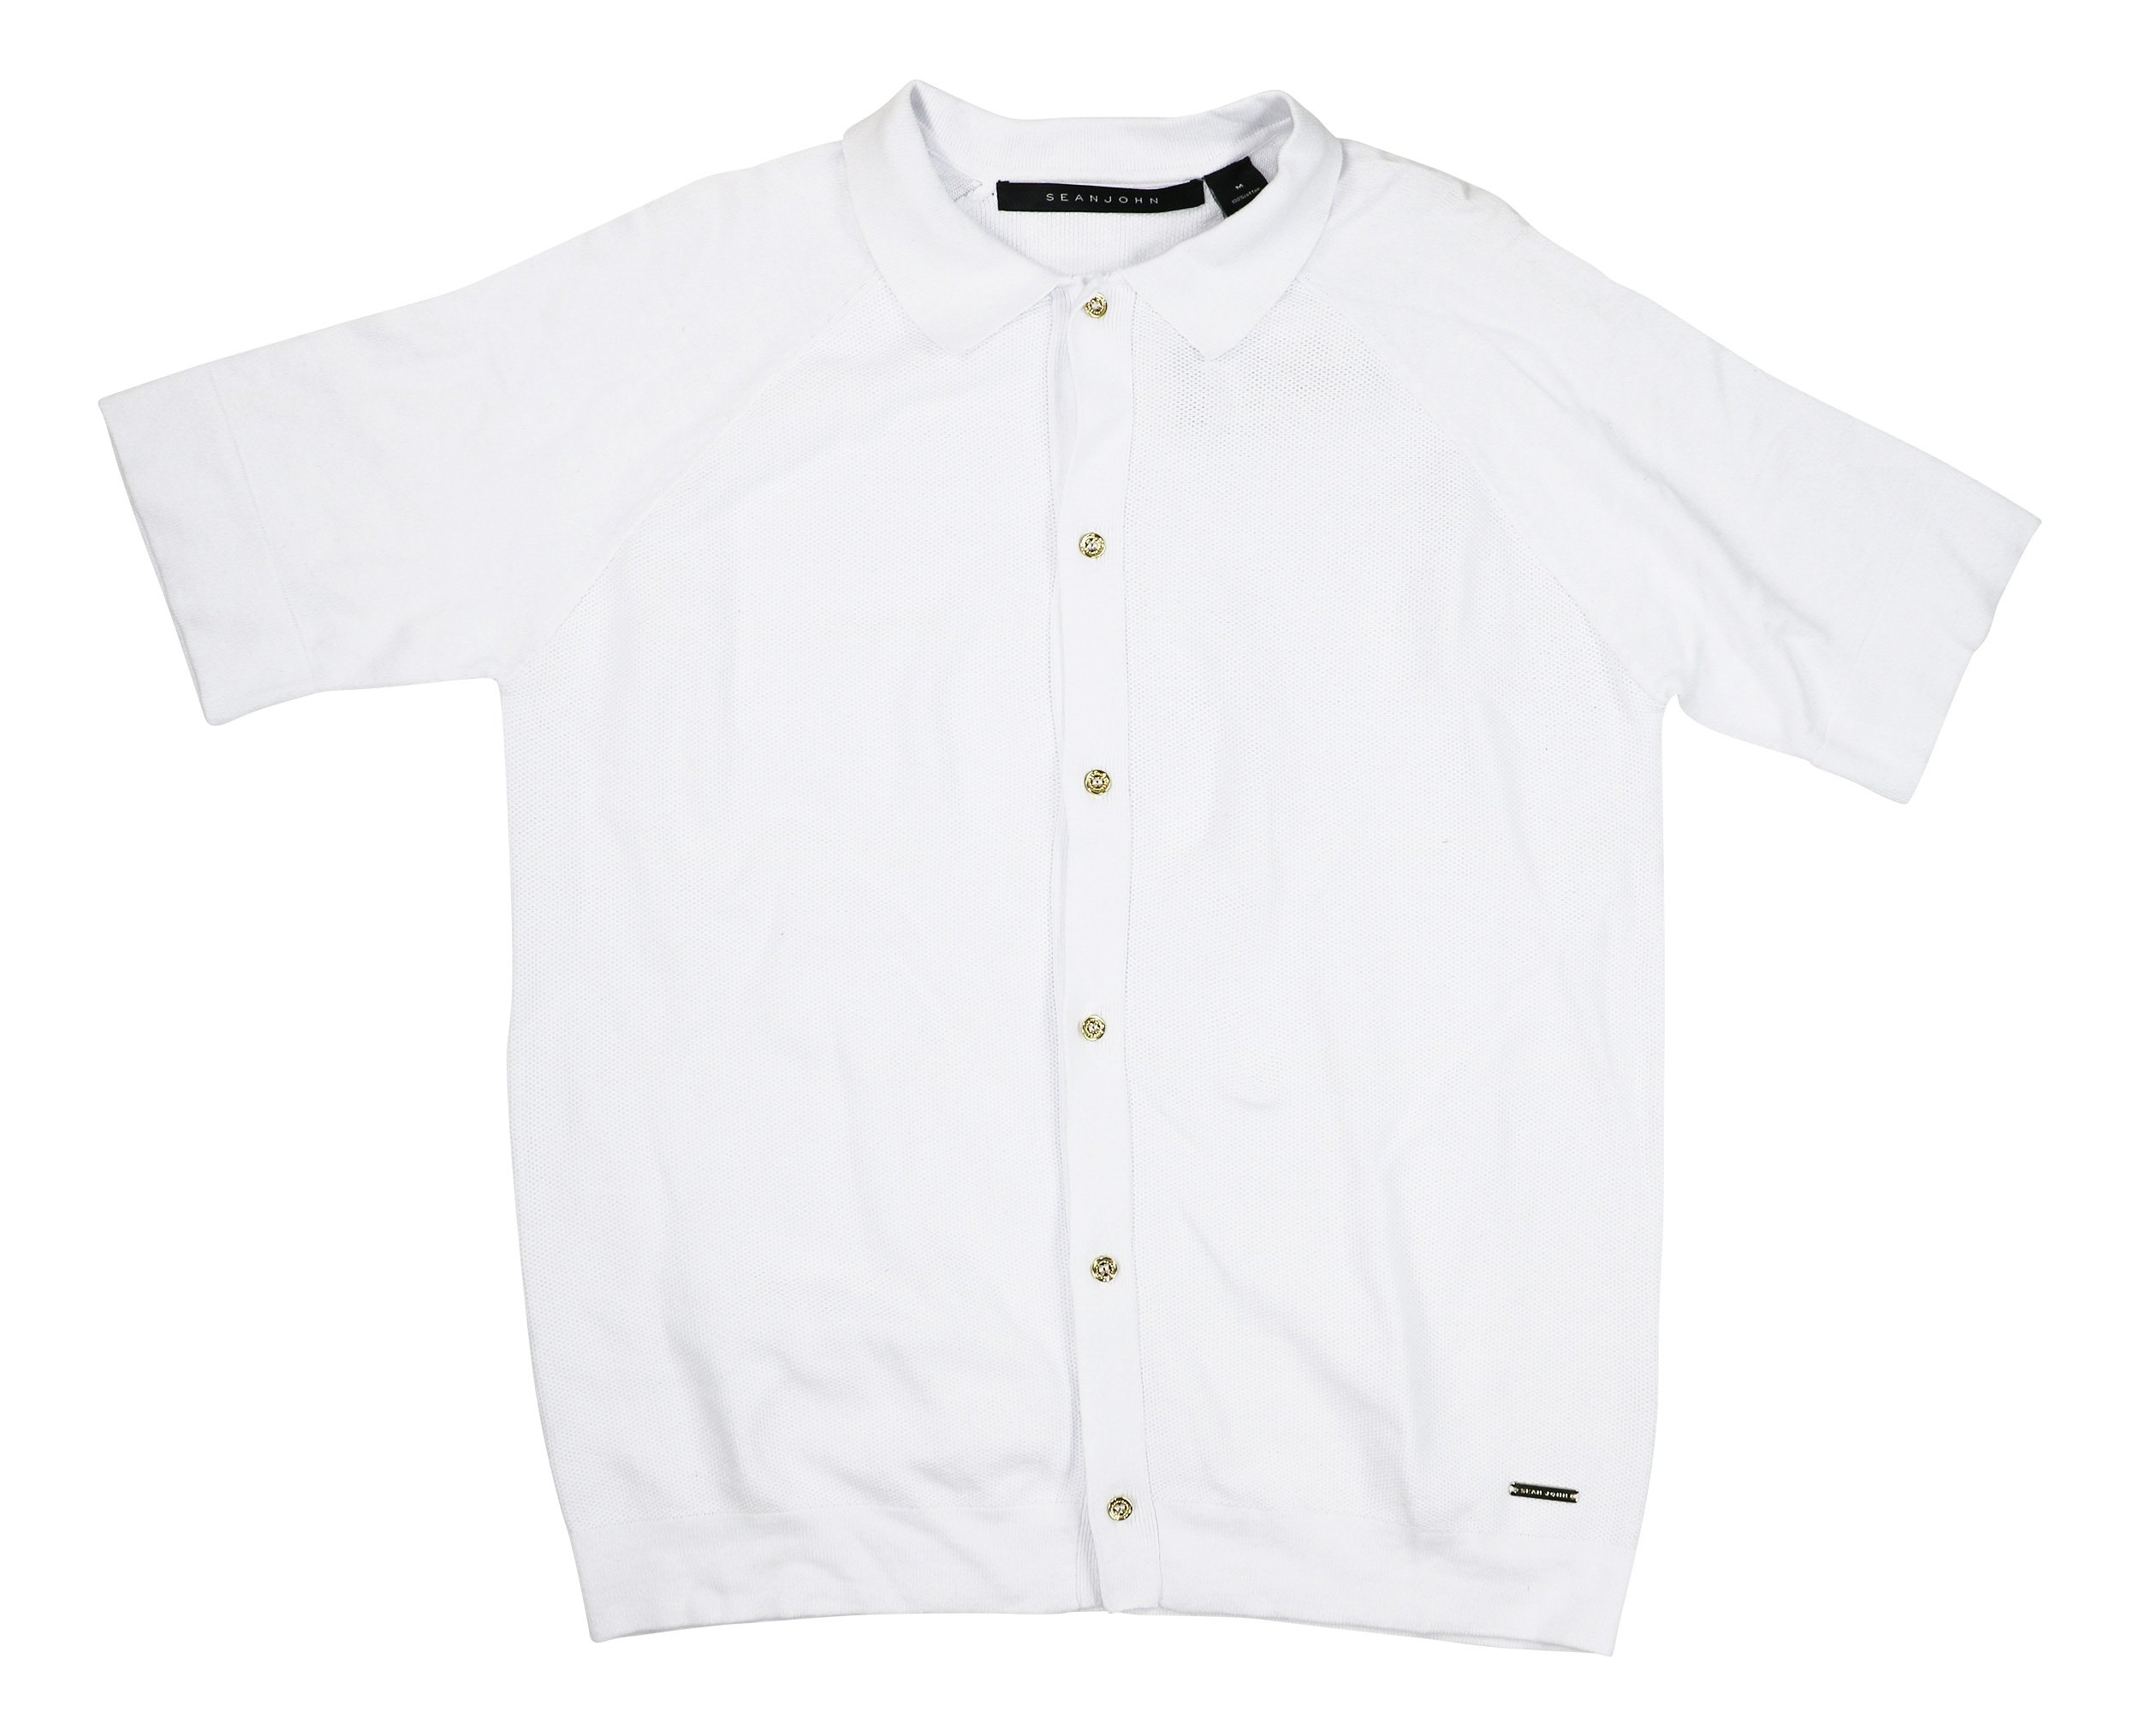 Sean John Mens Short-Sleeve Button-Front Cotton Sweater Bright White 3XL by Sean John